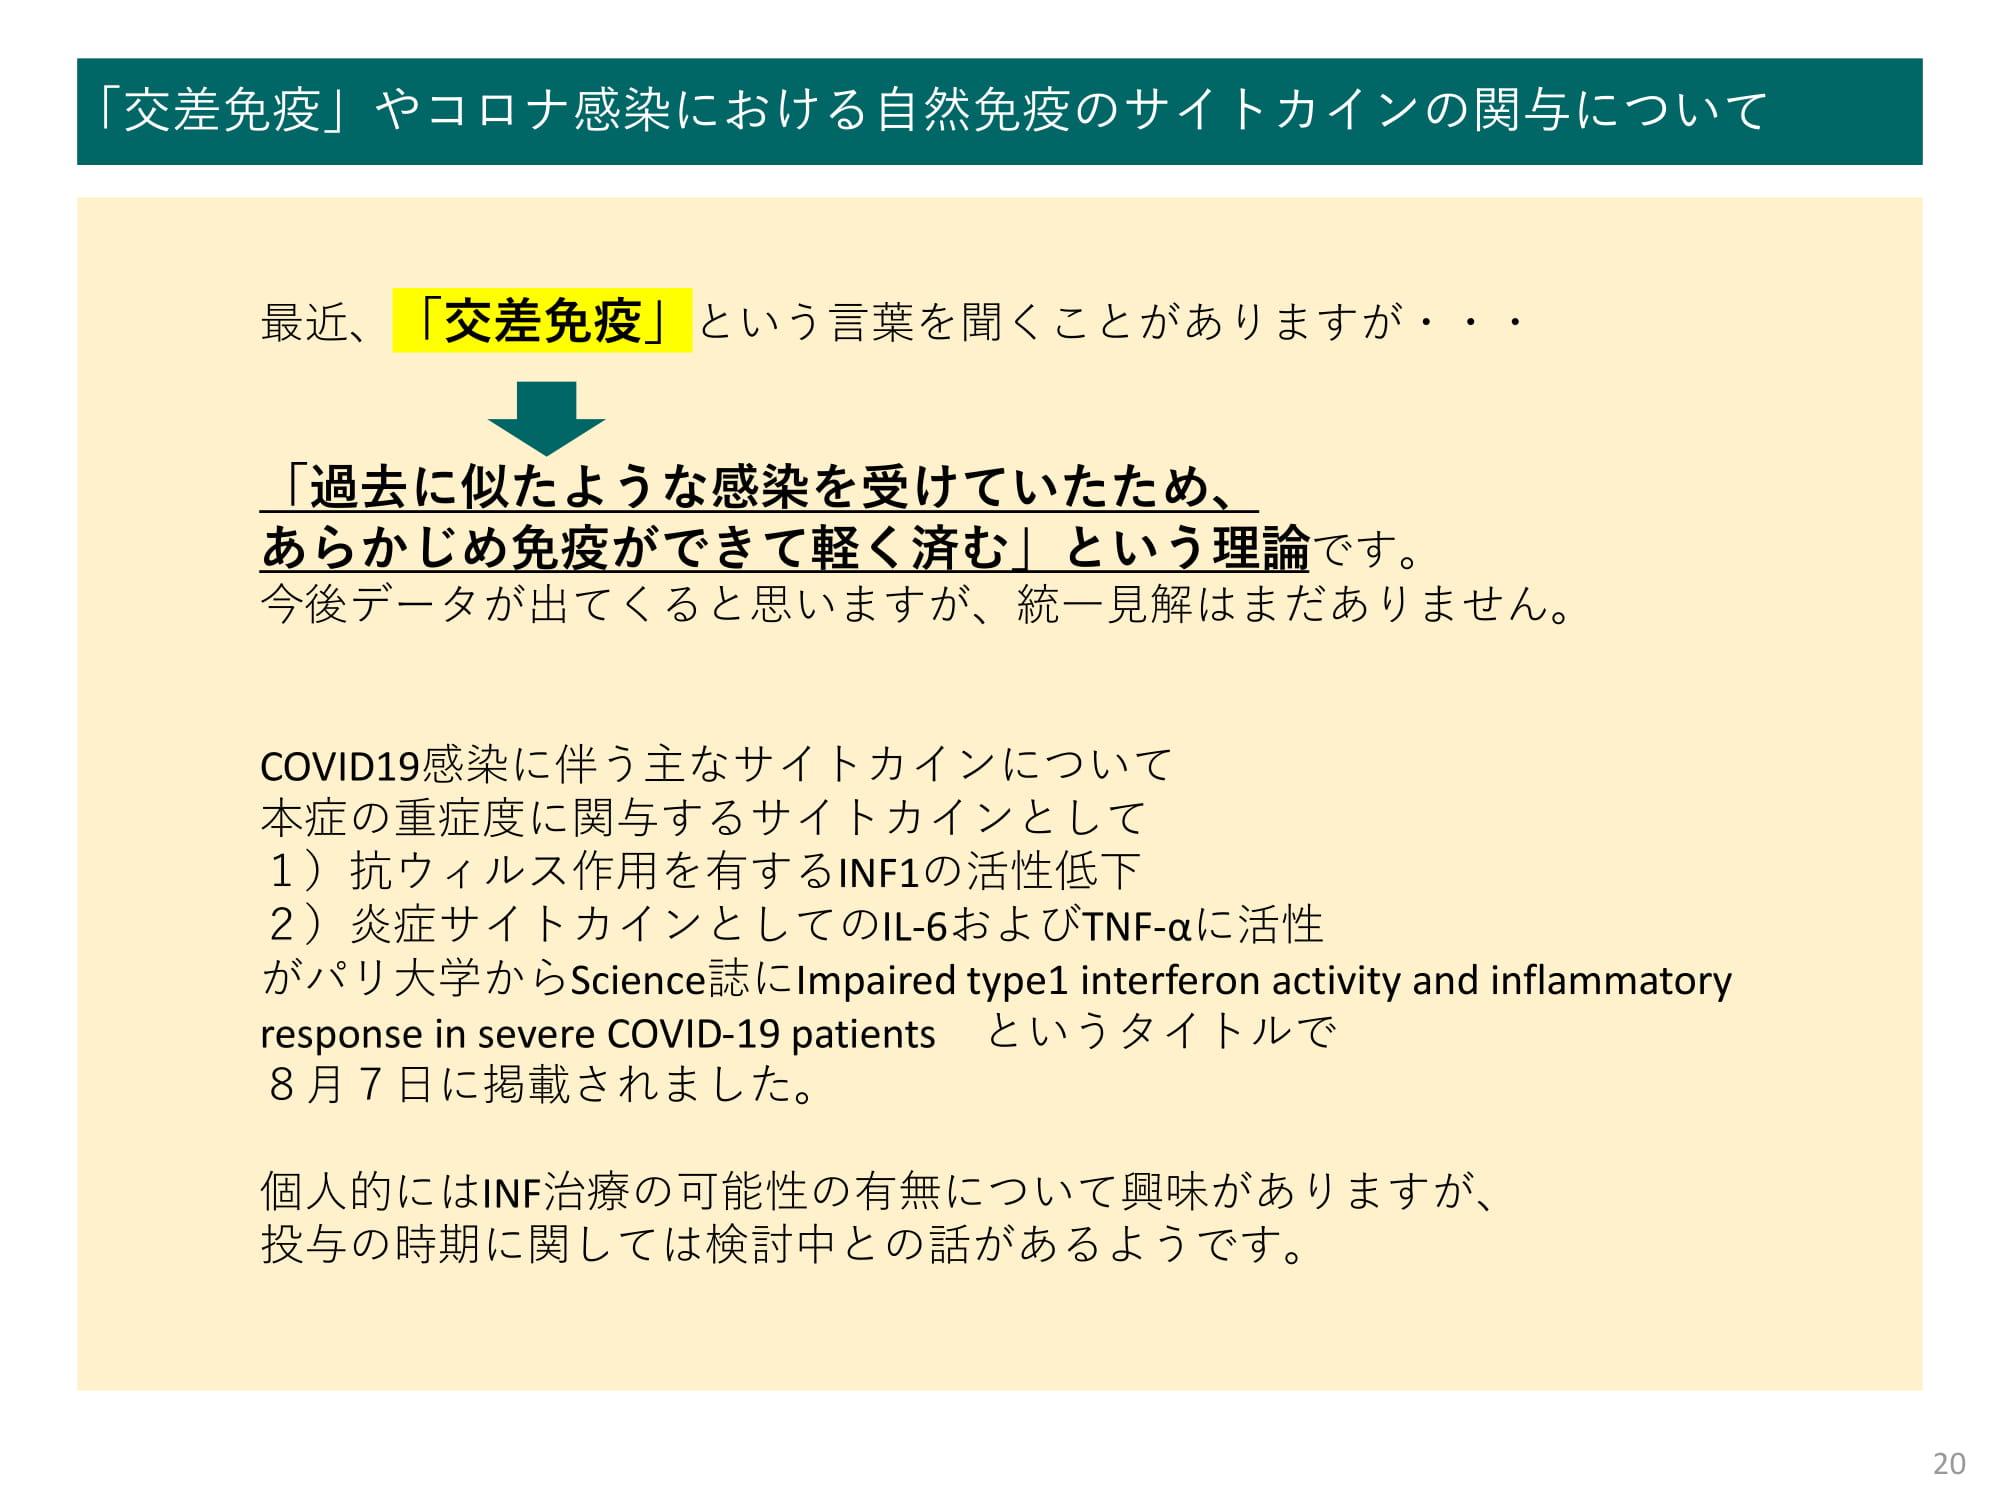 COVID-19_20200904-20.jpg